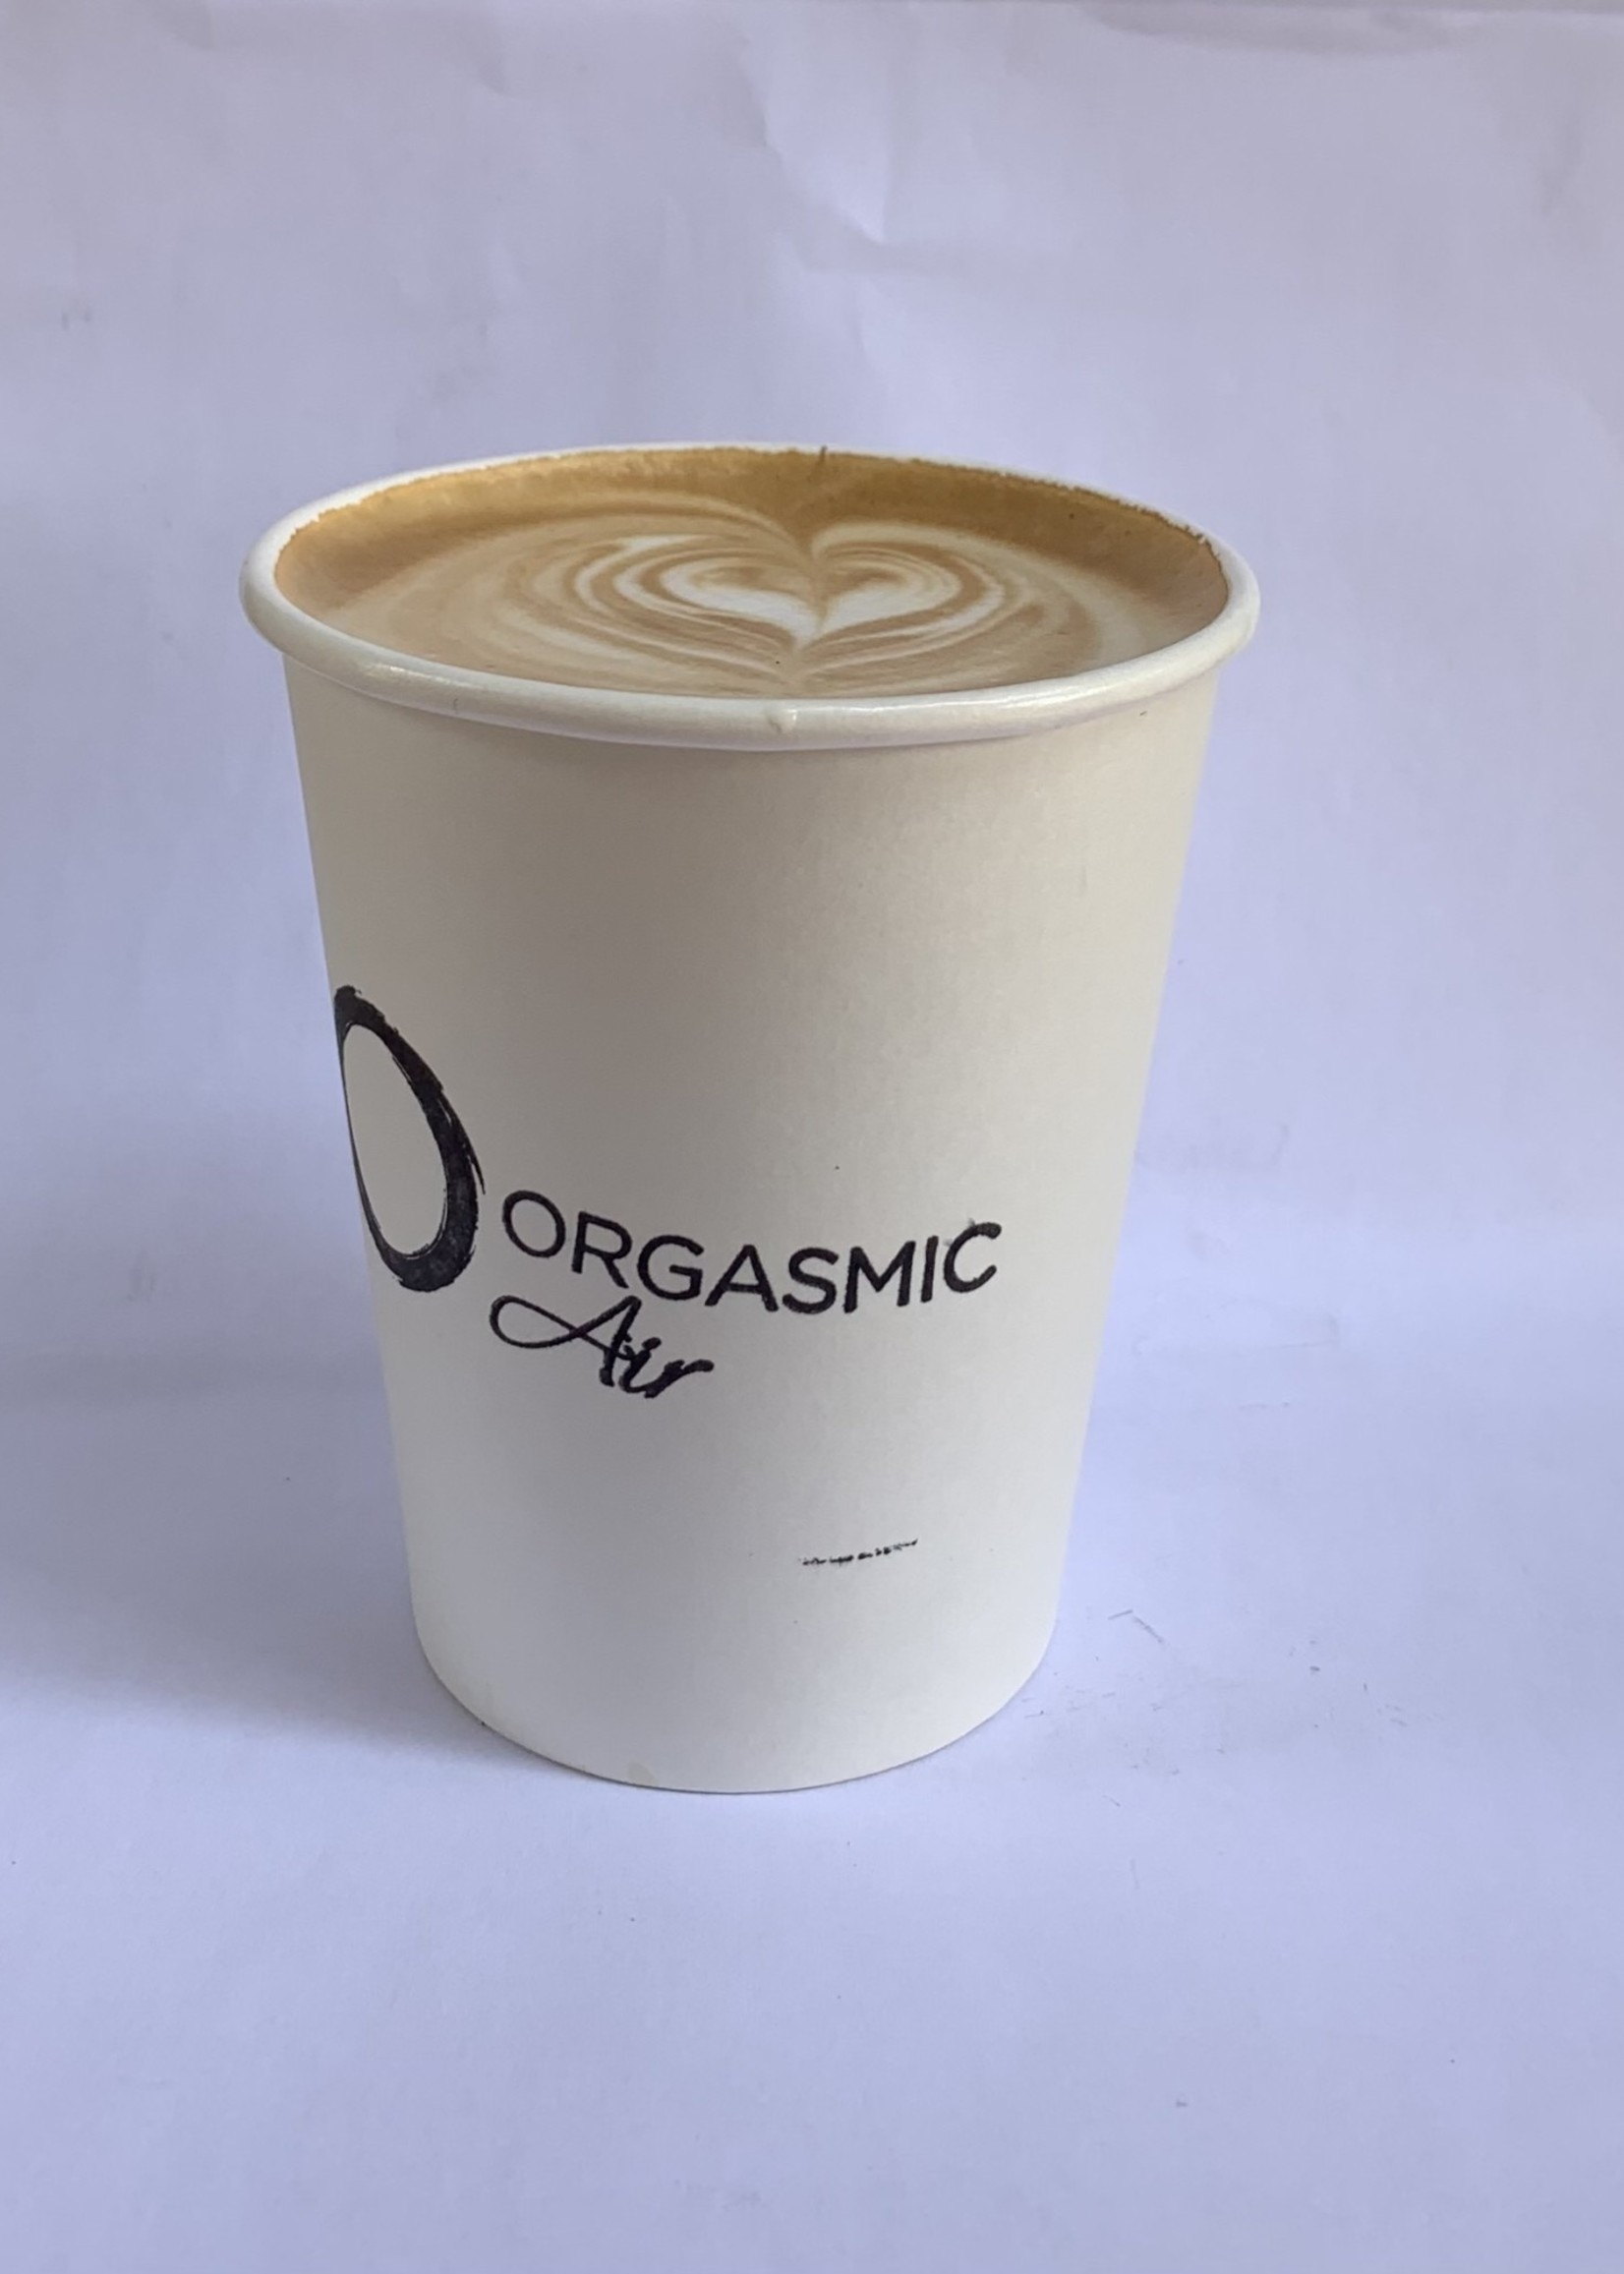 Organic & Air CBD infused caramel cappuccino